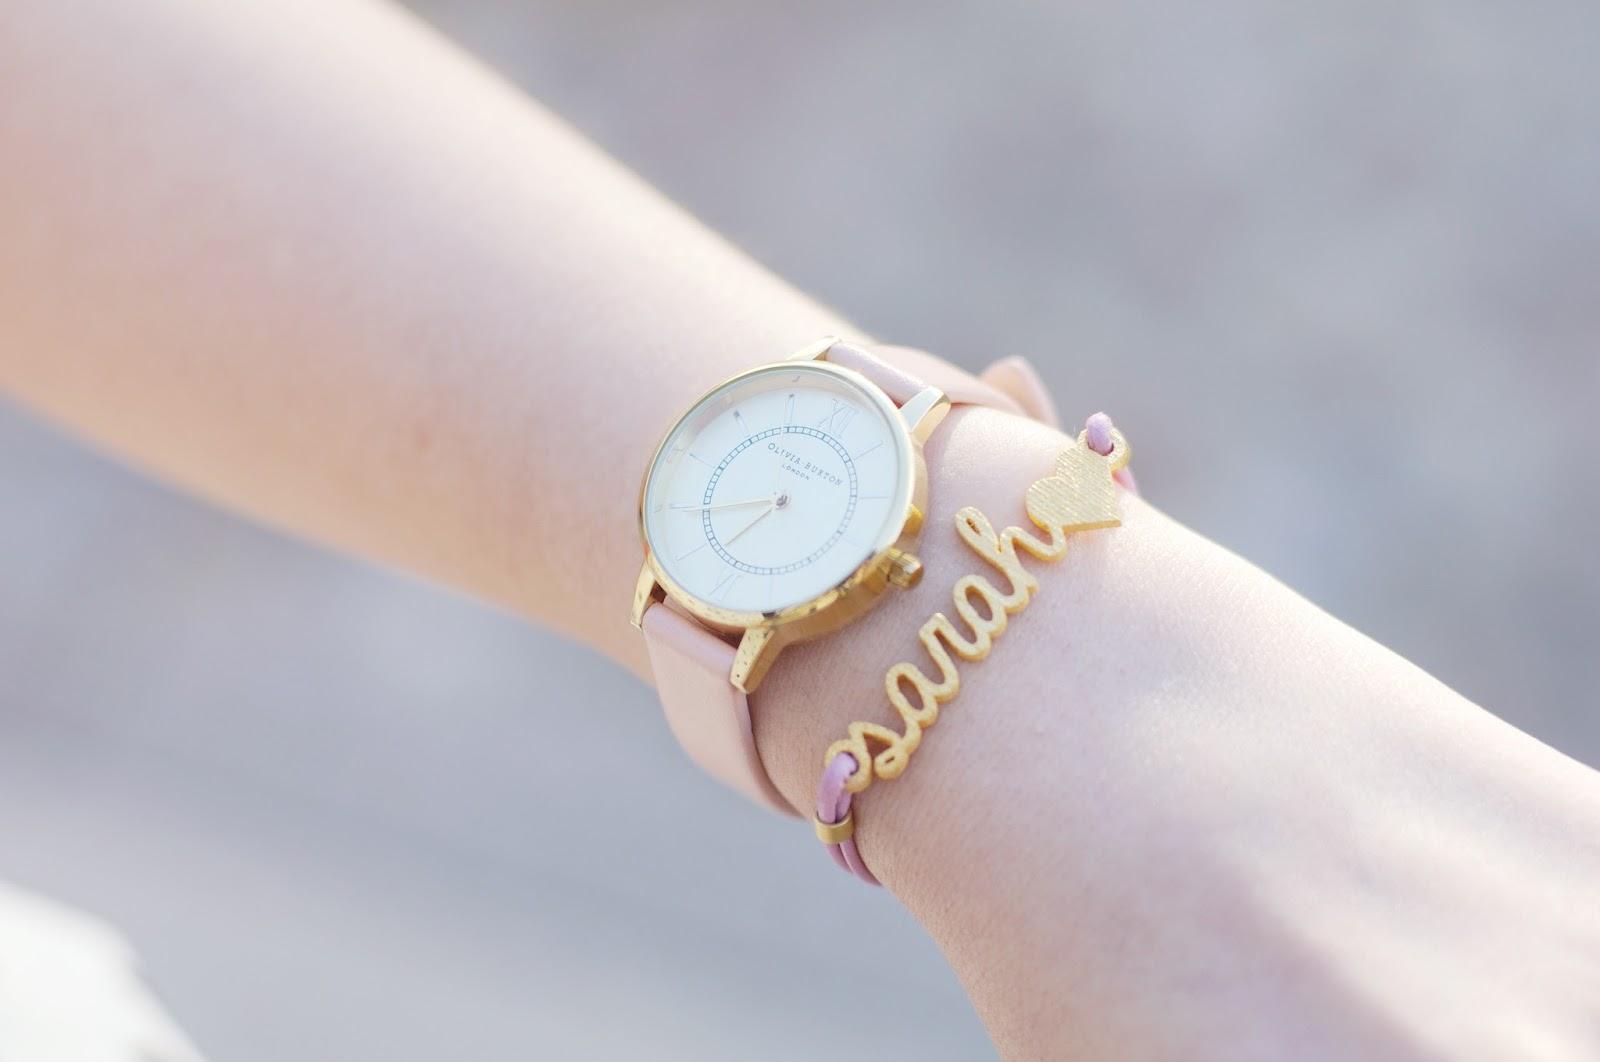 personalised jewellery, name bracelet, olivia burton watch